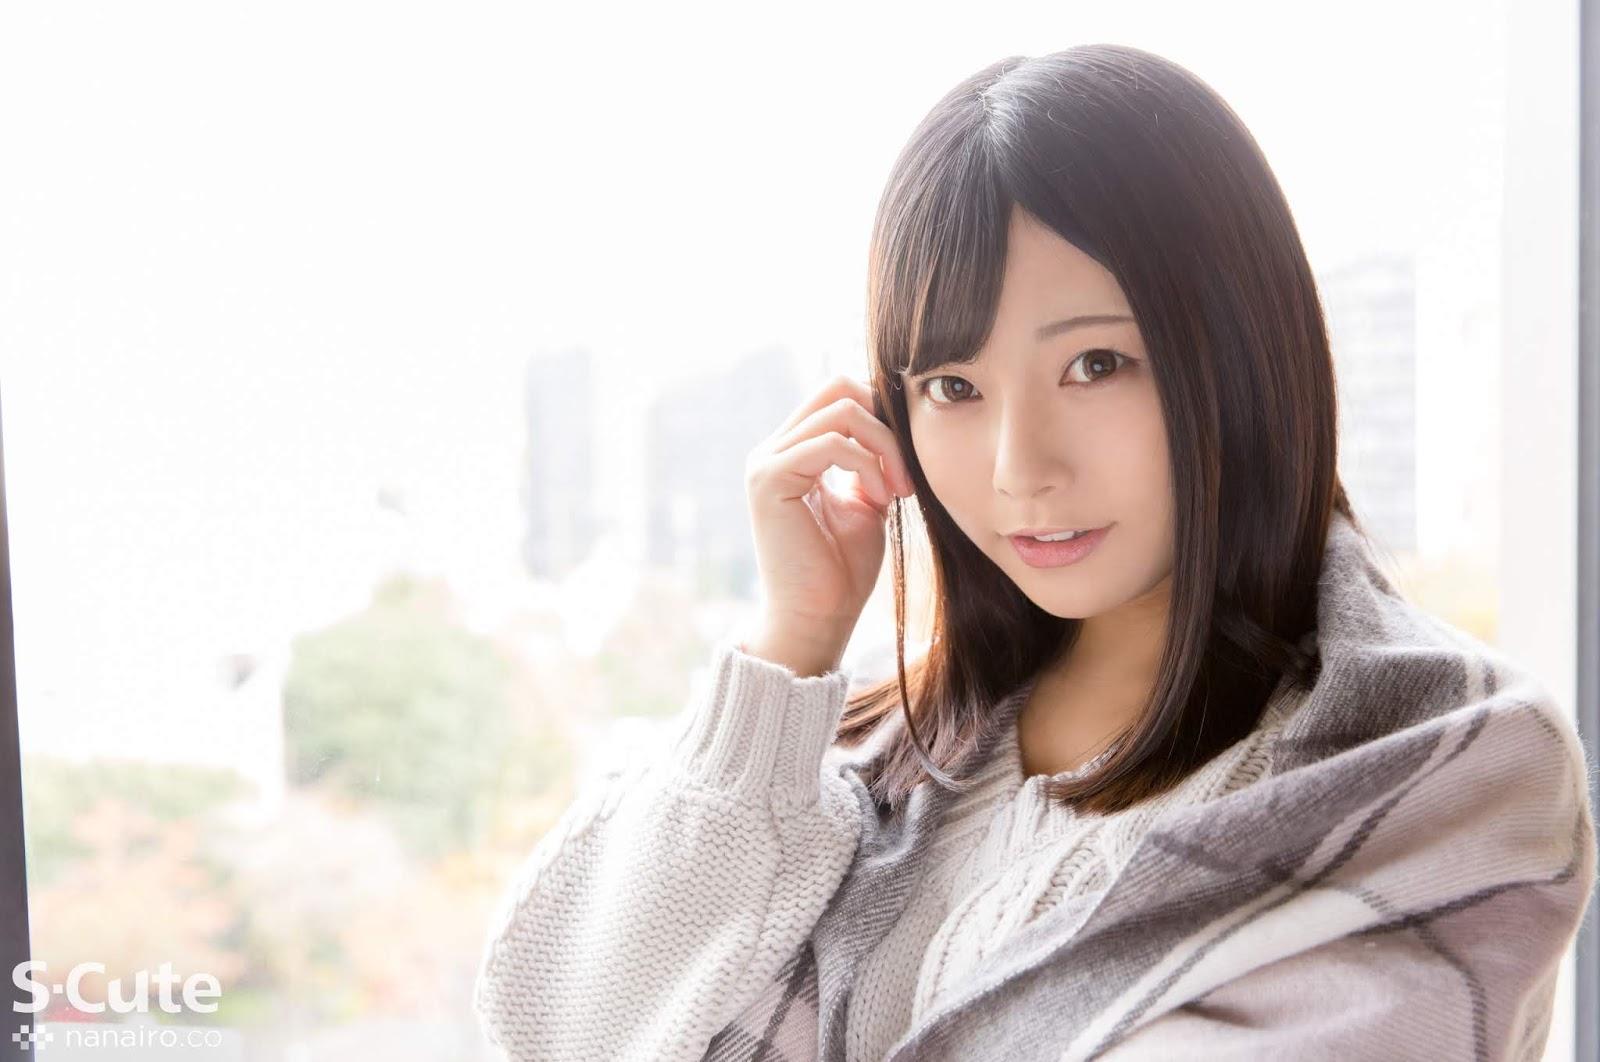 S-Cute 765_azusa_01 いっぱいナカ出して/Azusa - idols